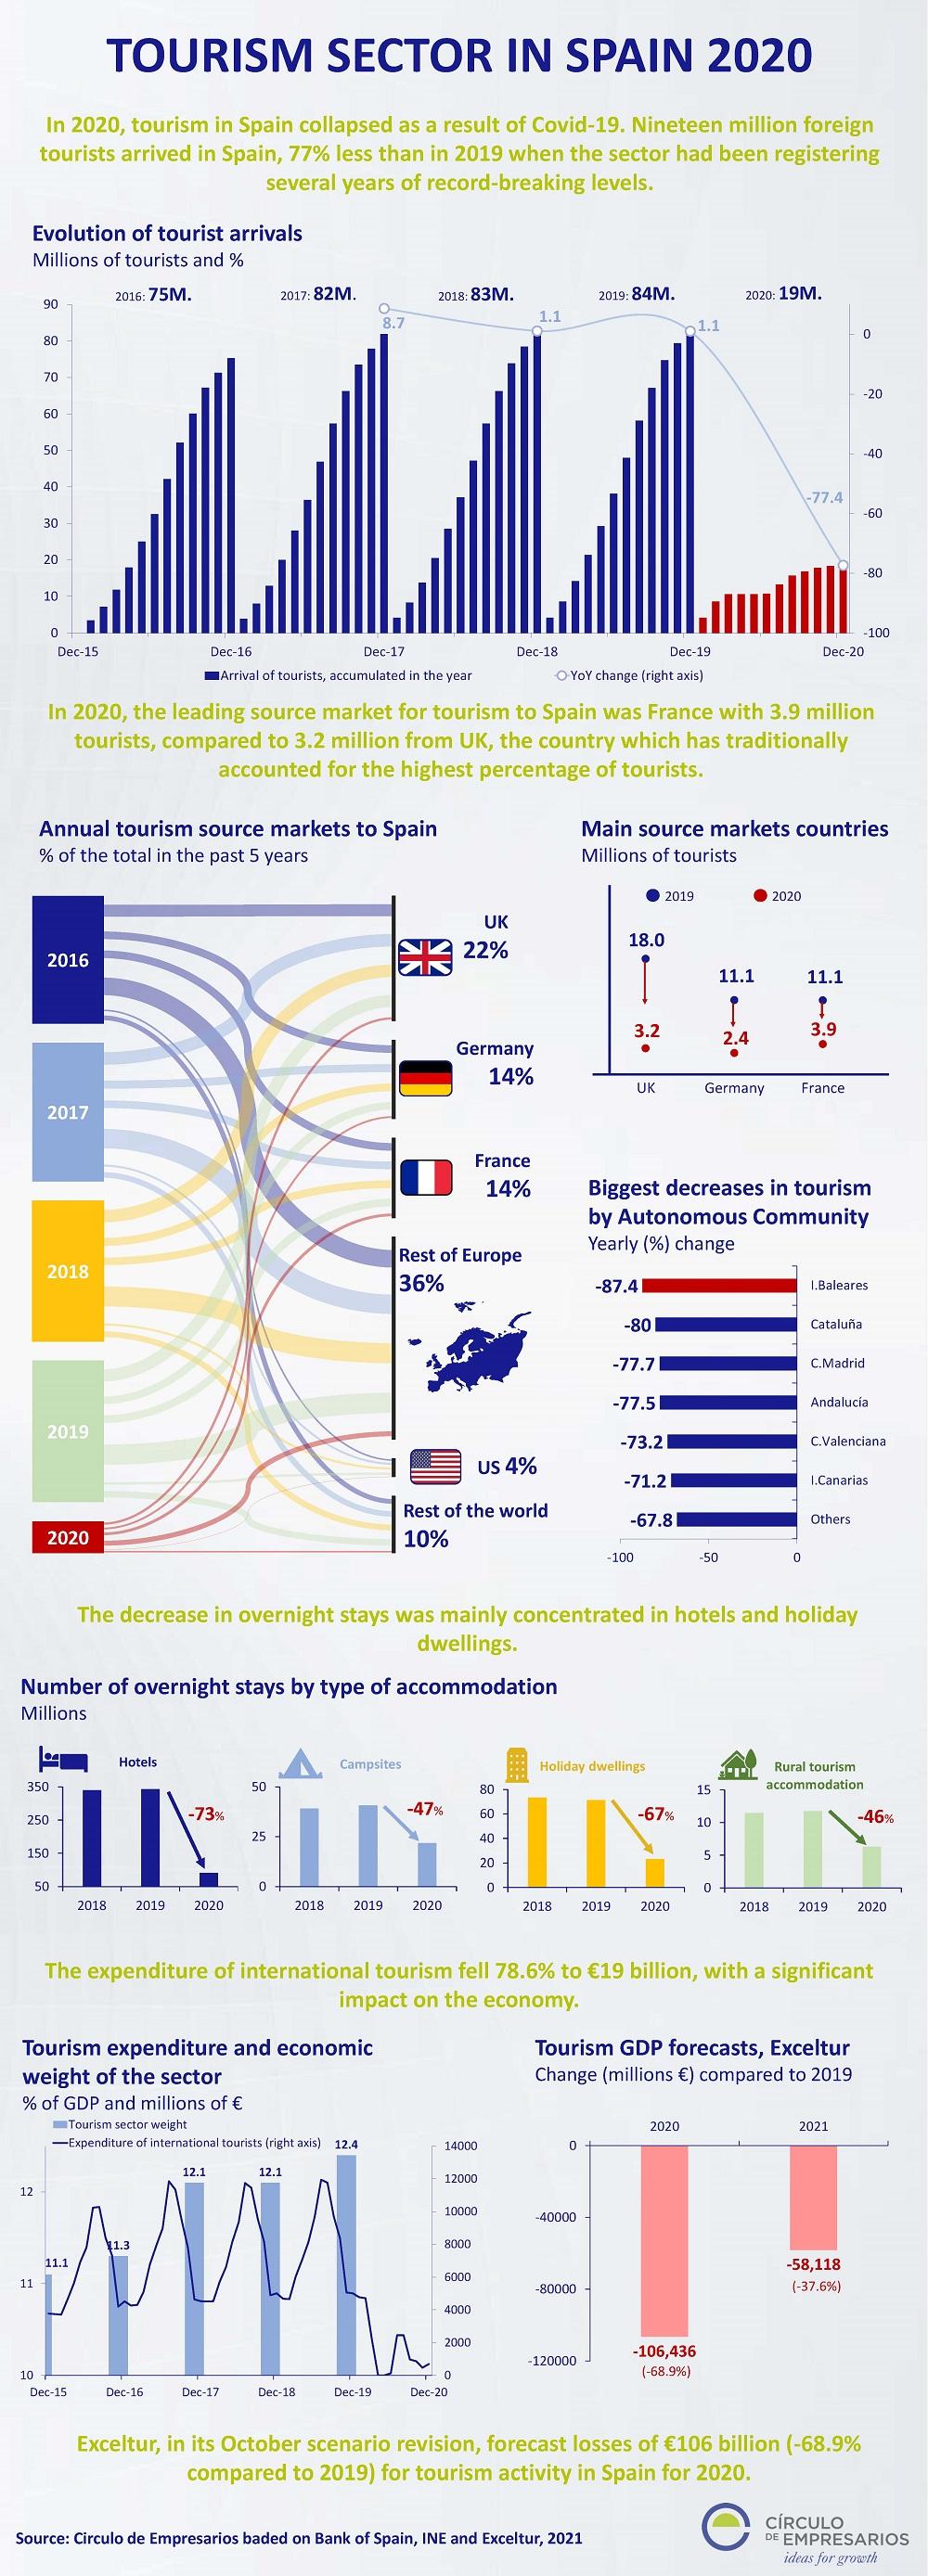 Tourism-sector-in-Spain-2020-infographic-February-2021-Circulo-de-Empresarios